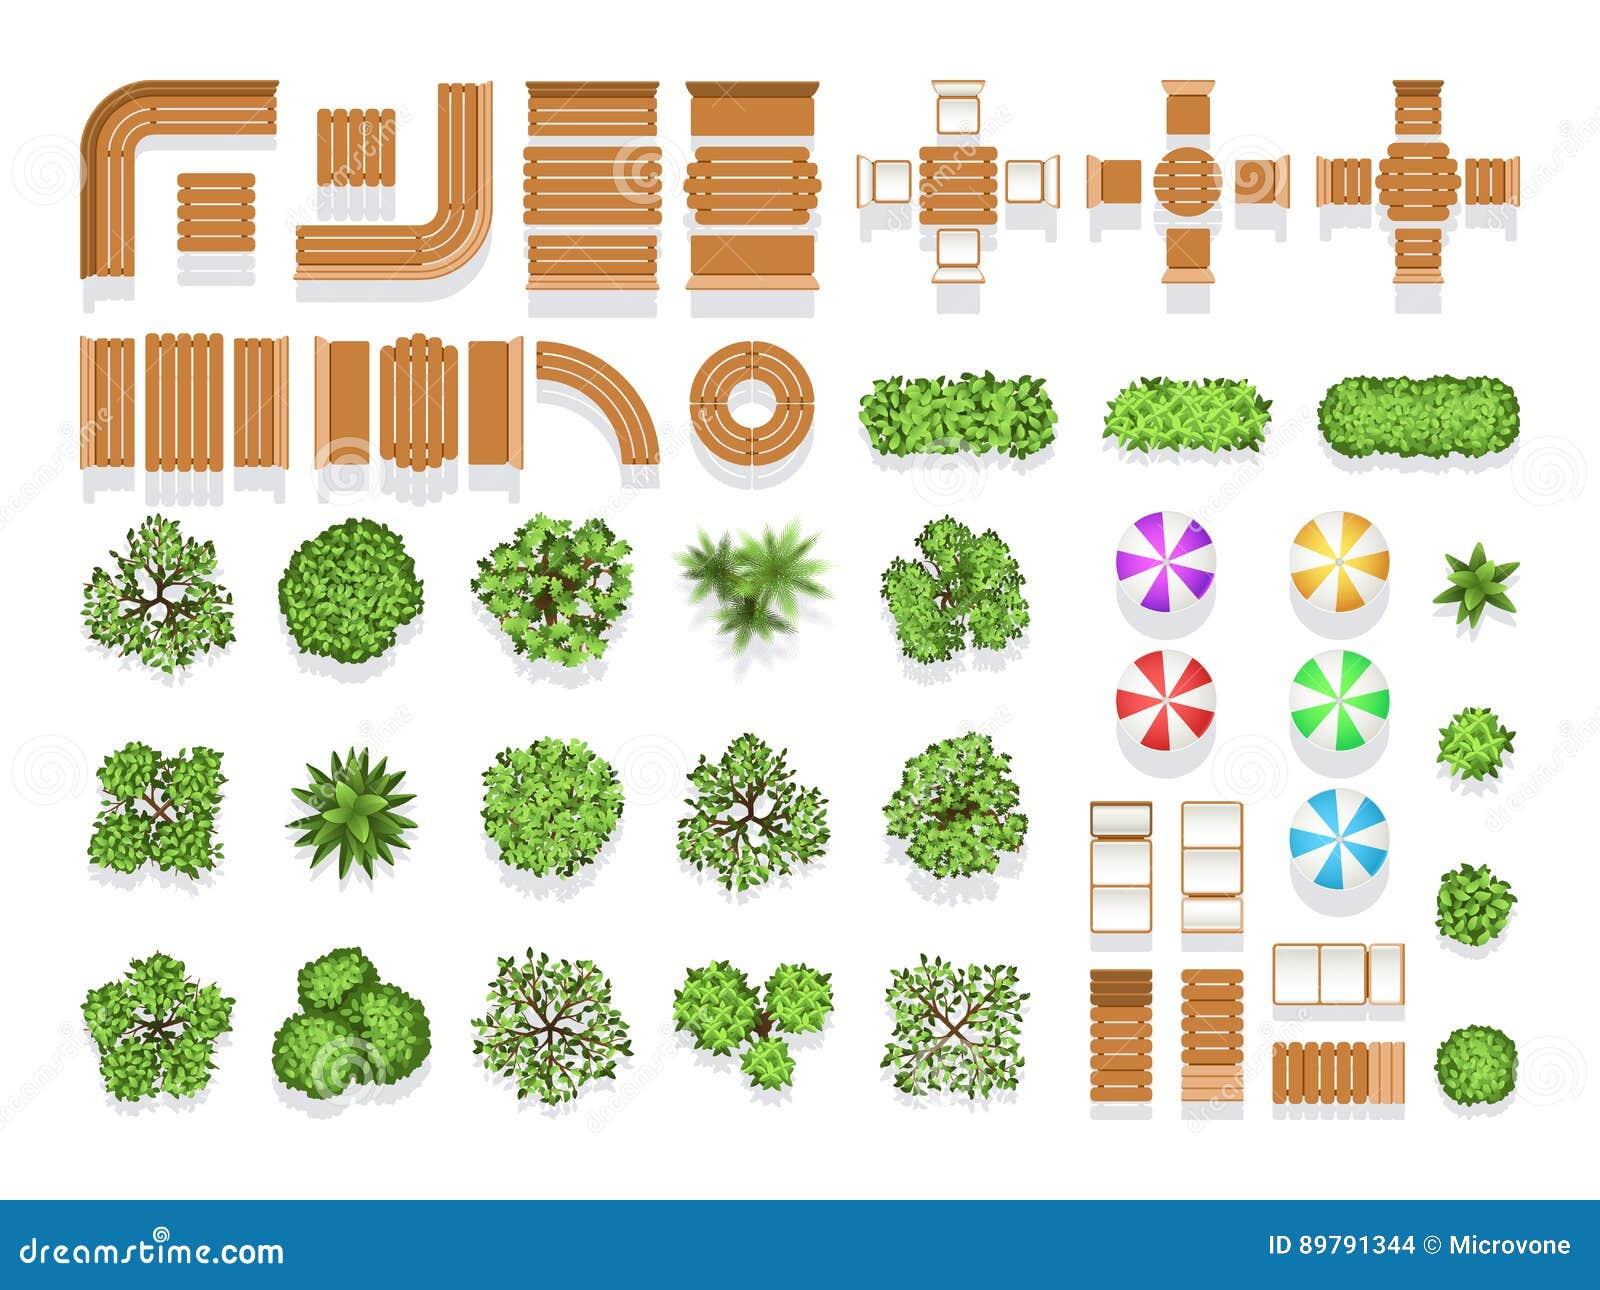 Garden City Jeep >> Top View Of The City Vector Illustration | CartoonDealer.com #68652454